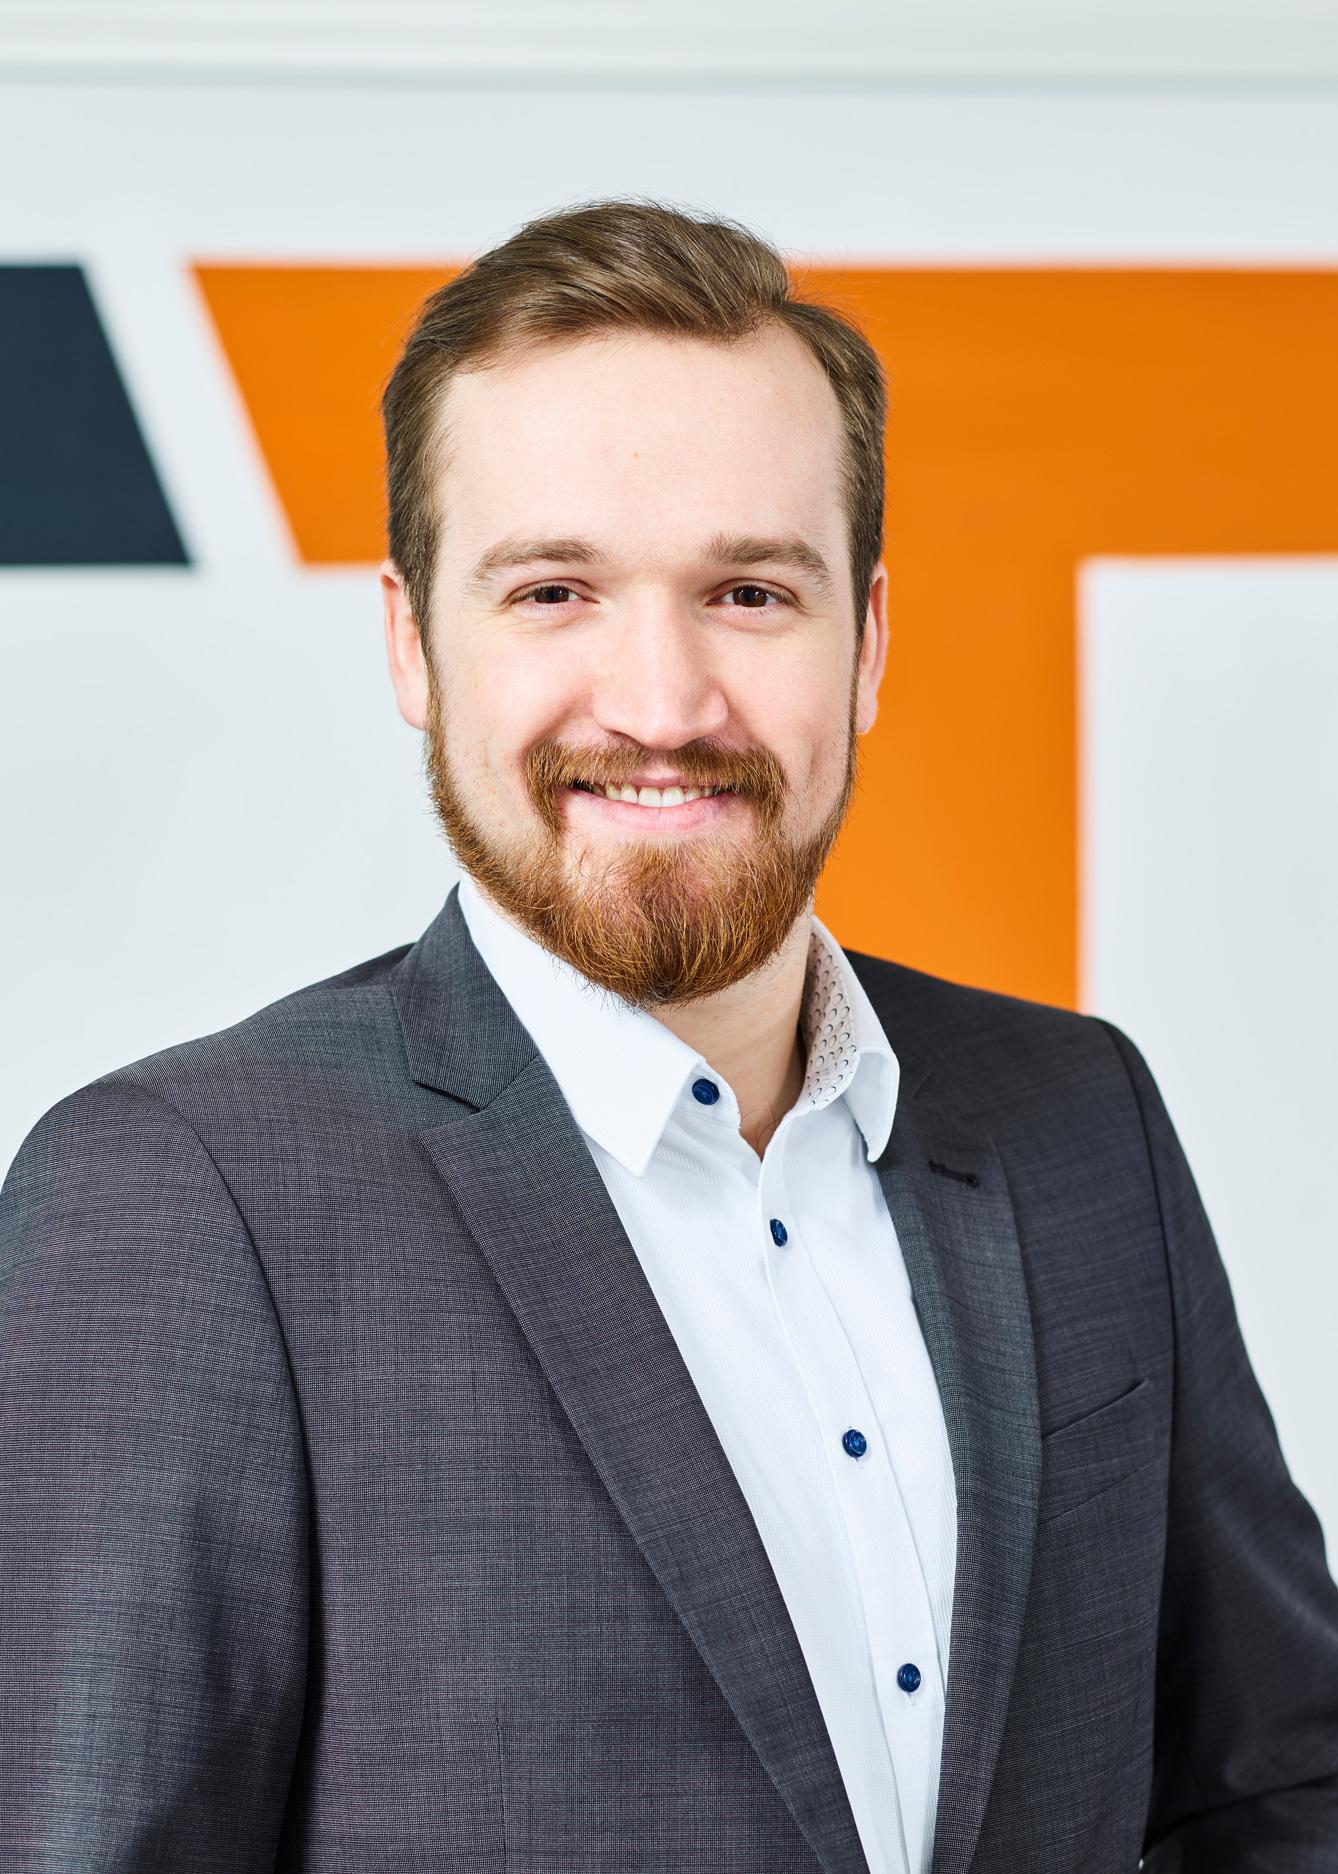 Benedikt Pohlner